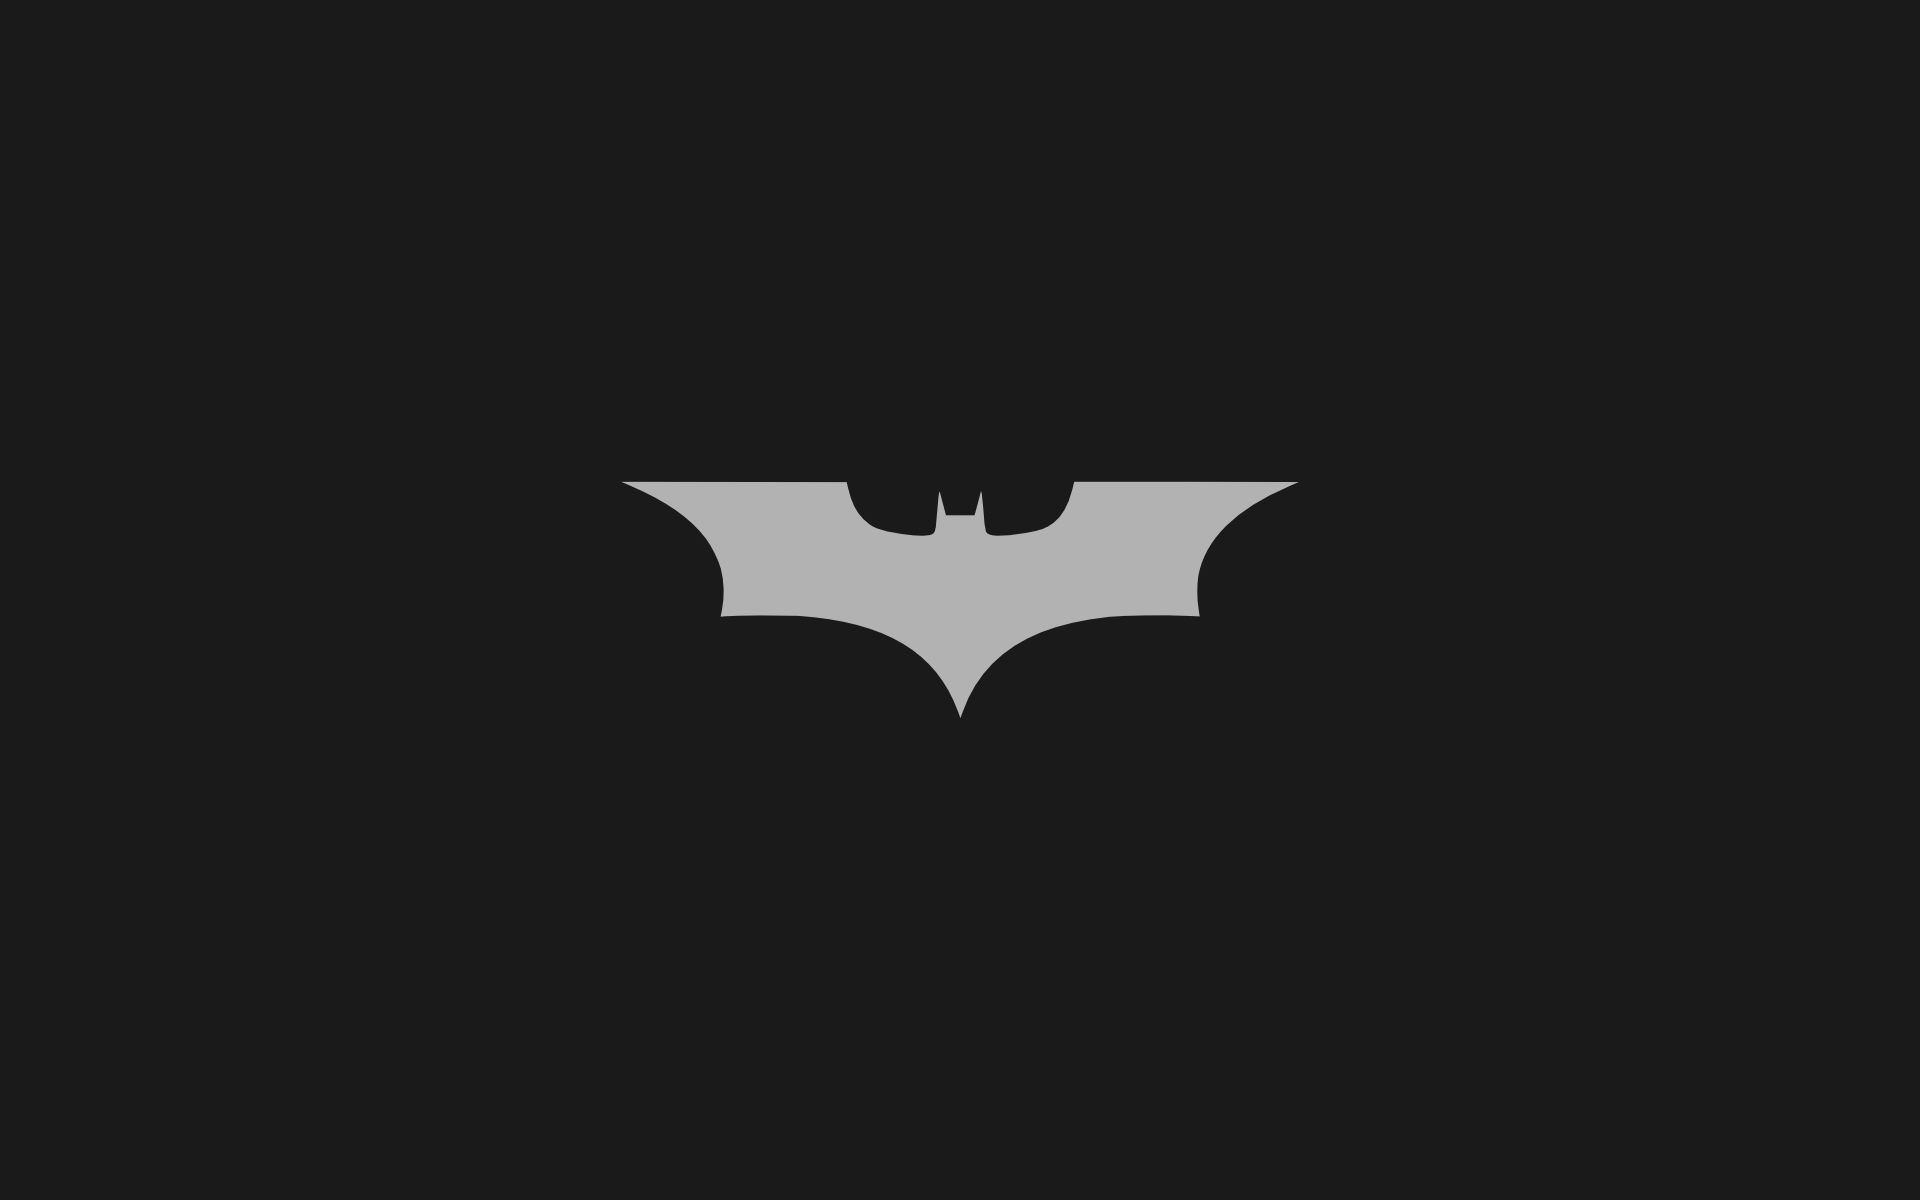 Minimalistic Batman Logo wallpapers Minimalistic Batman Logo stock 1920x1200